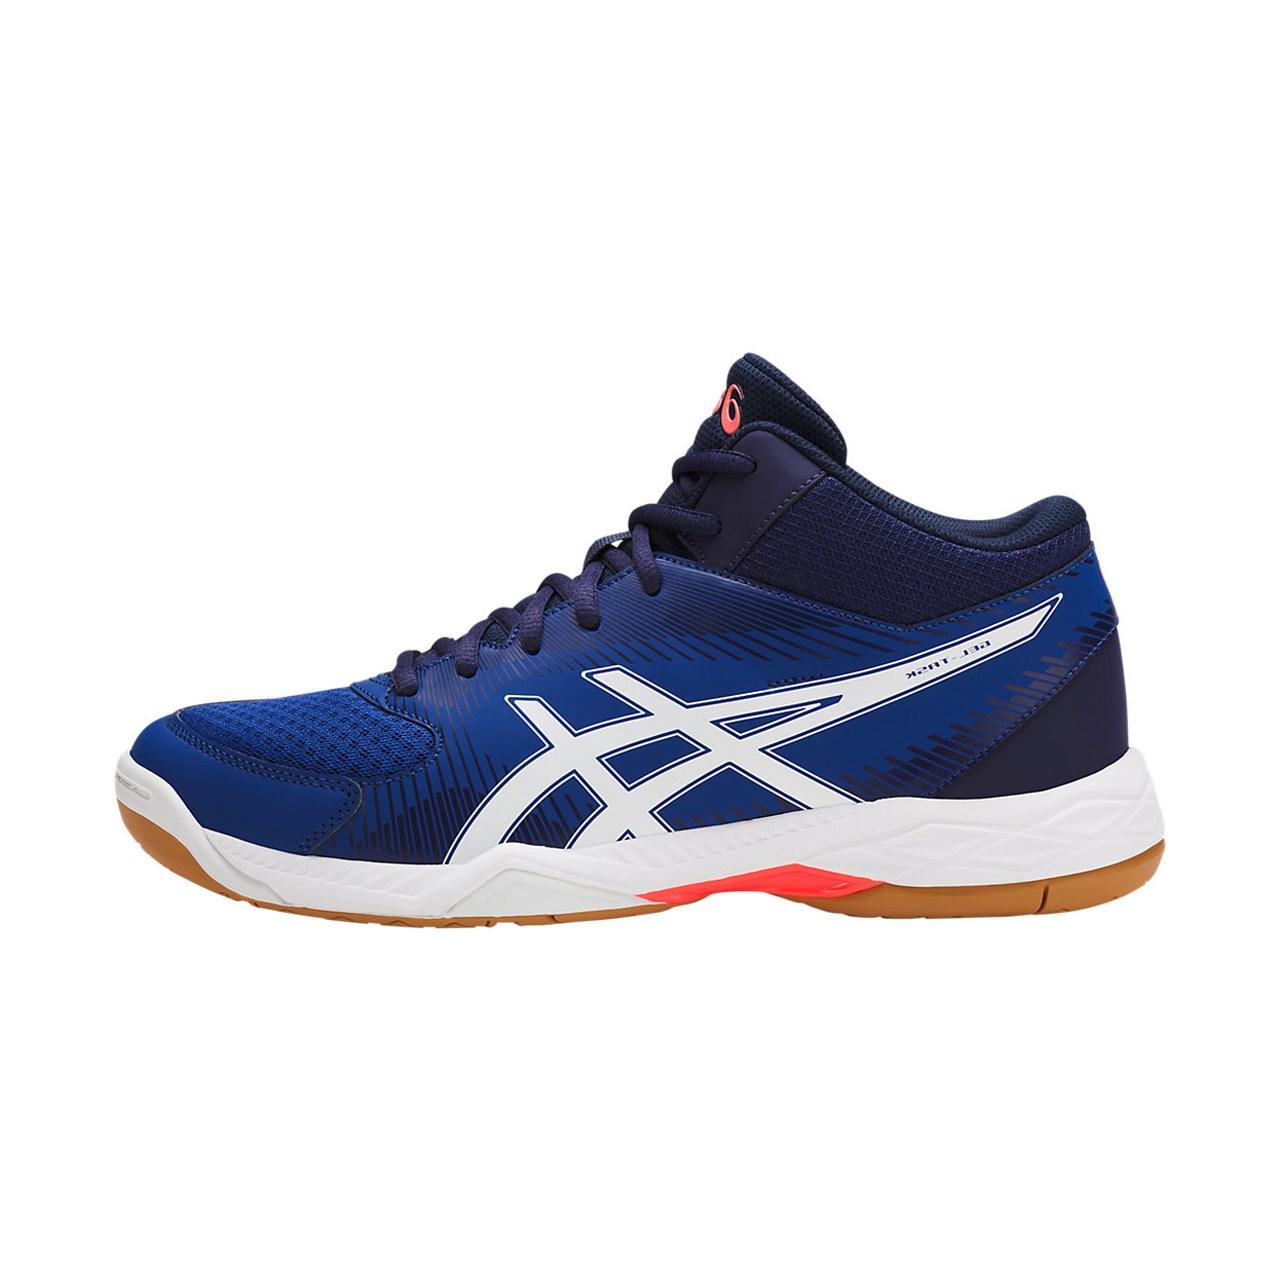 کفش والیبال مردانه اسیکس مدل GEL-TASK MT کد B703Y-4901